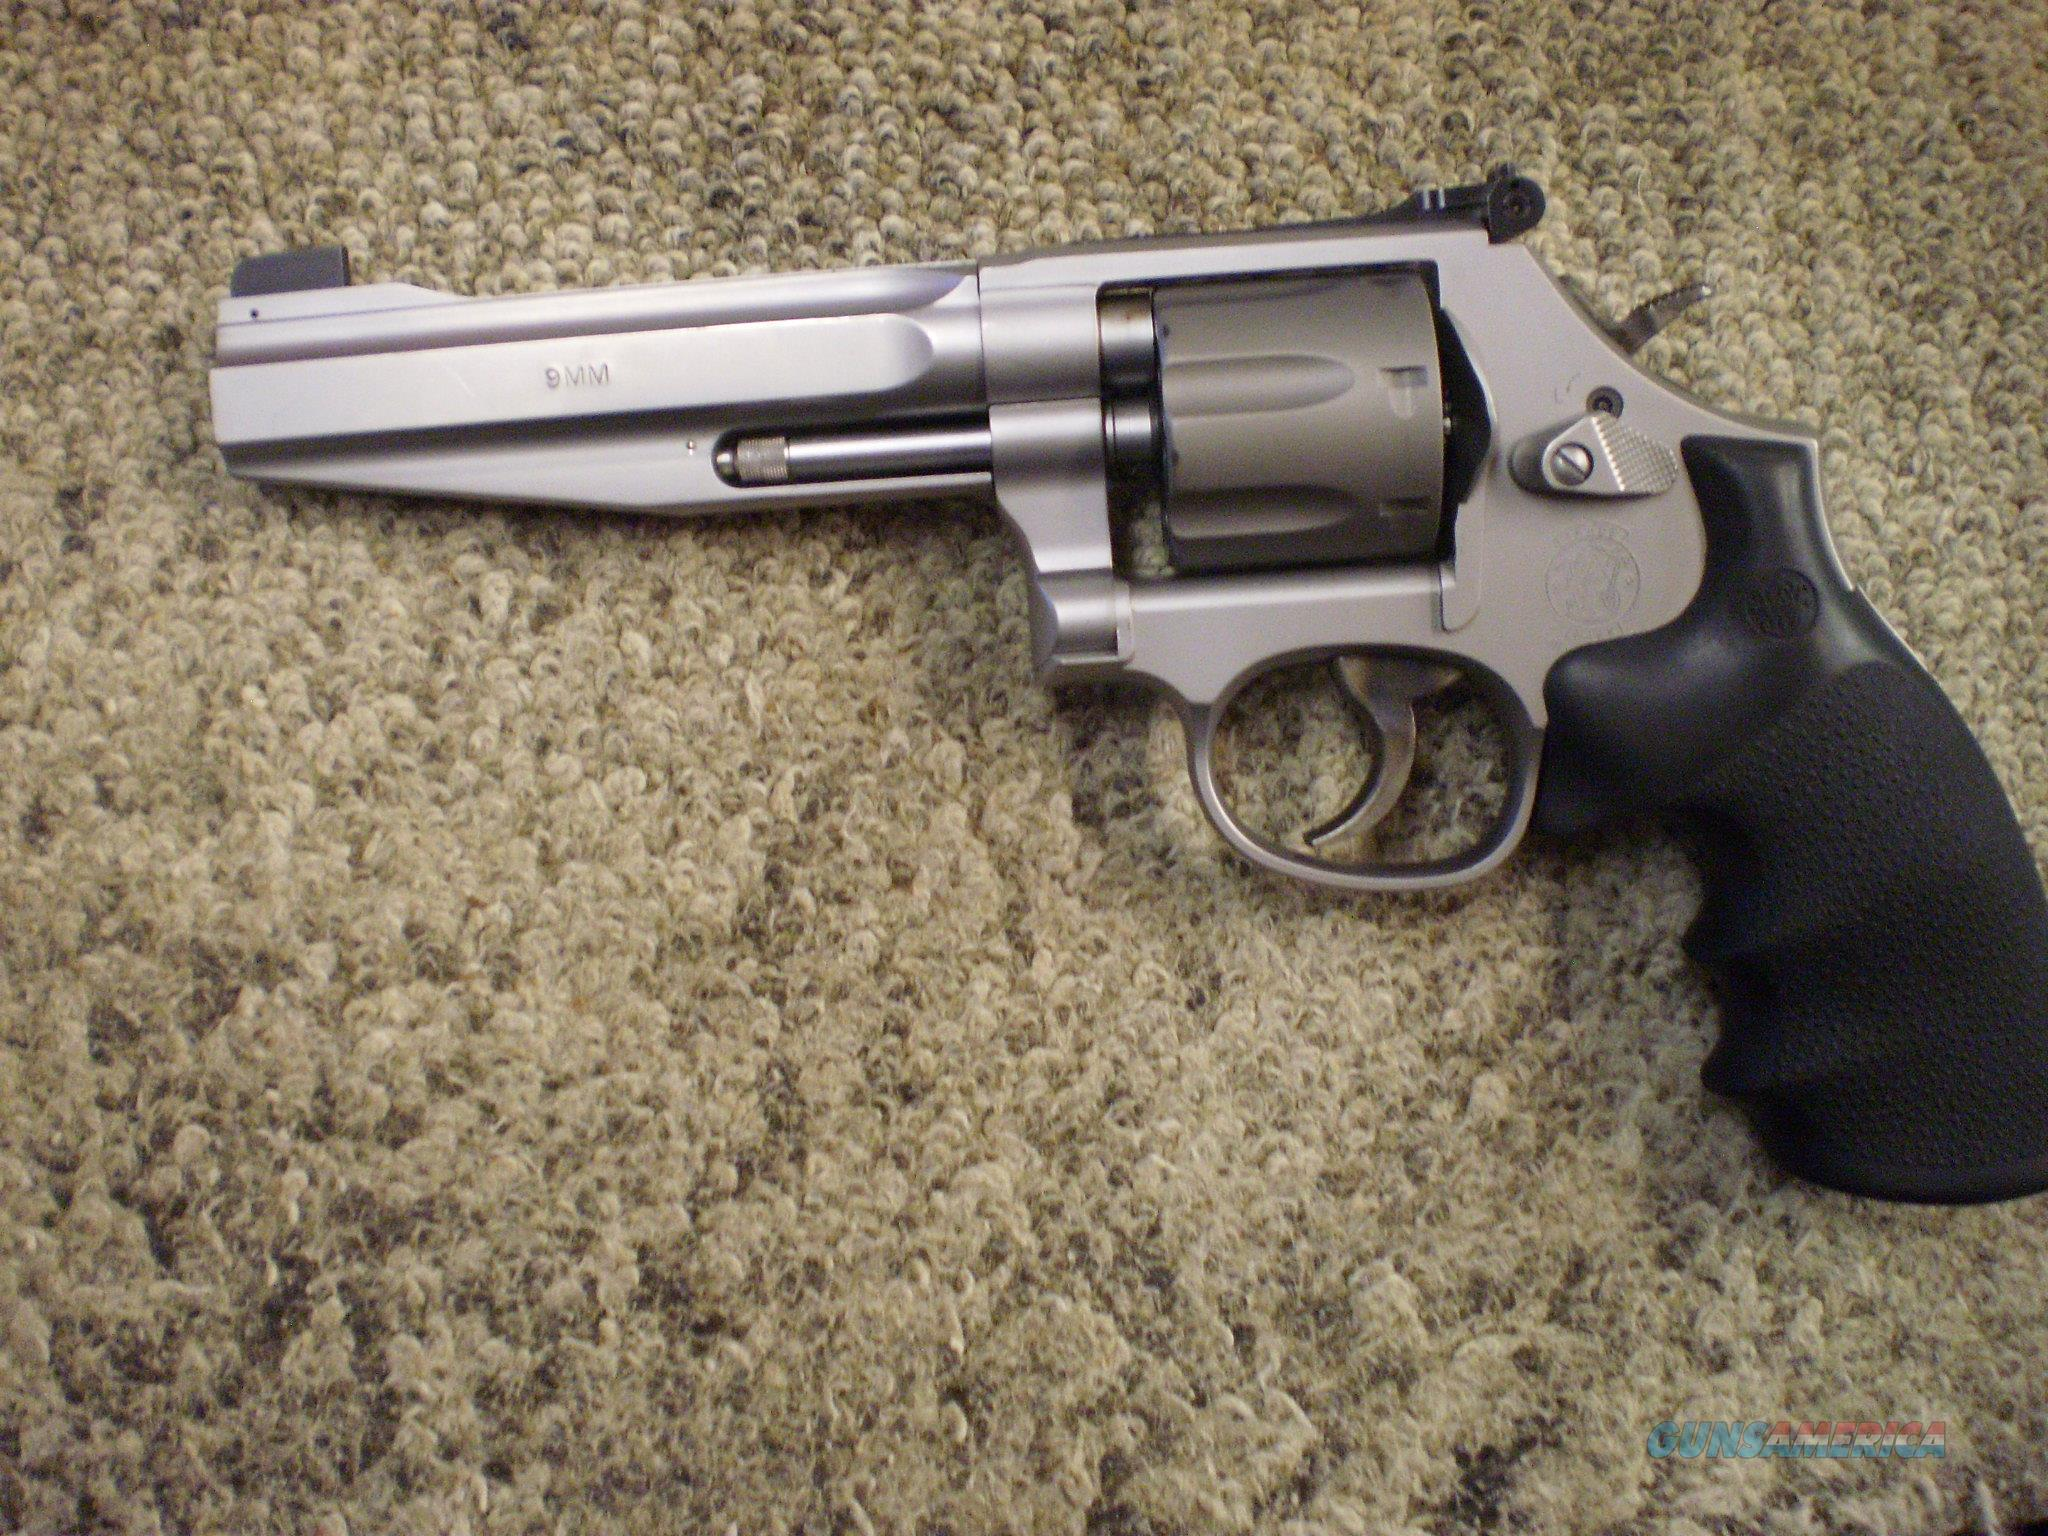 SMITH & WESSON MODEL 986 PRO 9MM  Guns > Pistols > Smith & Wesson Revolvers > Med. Frame ( K/L )